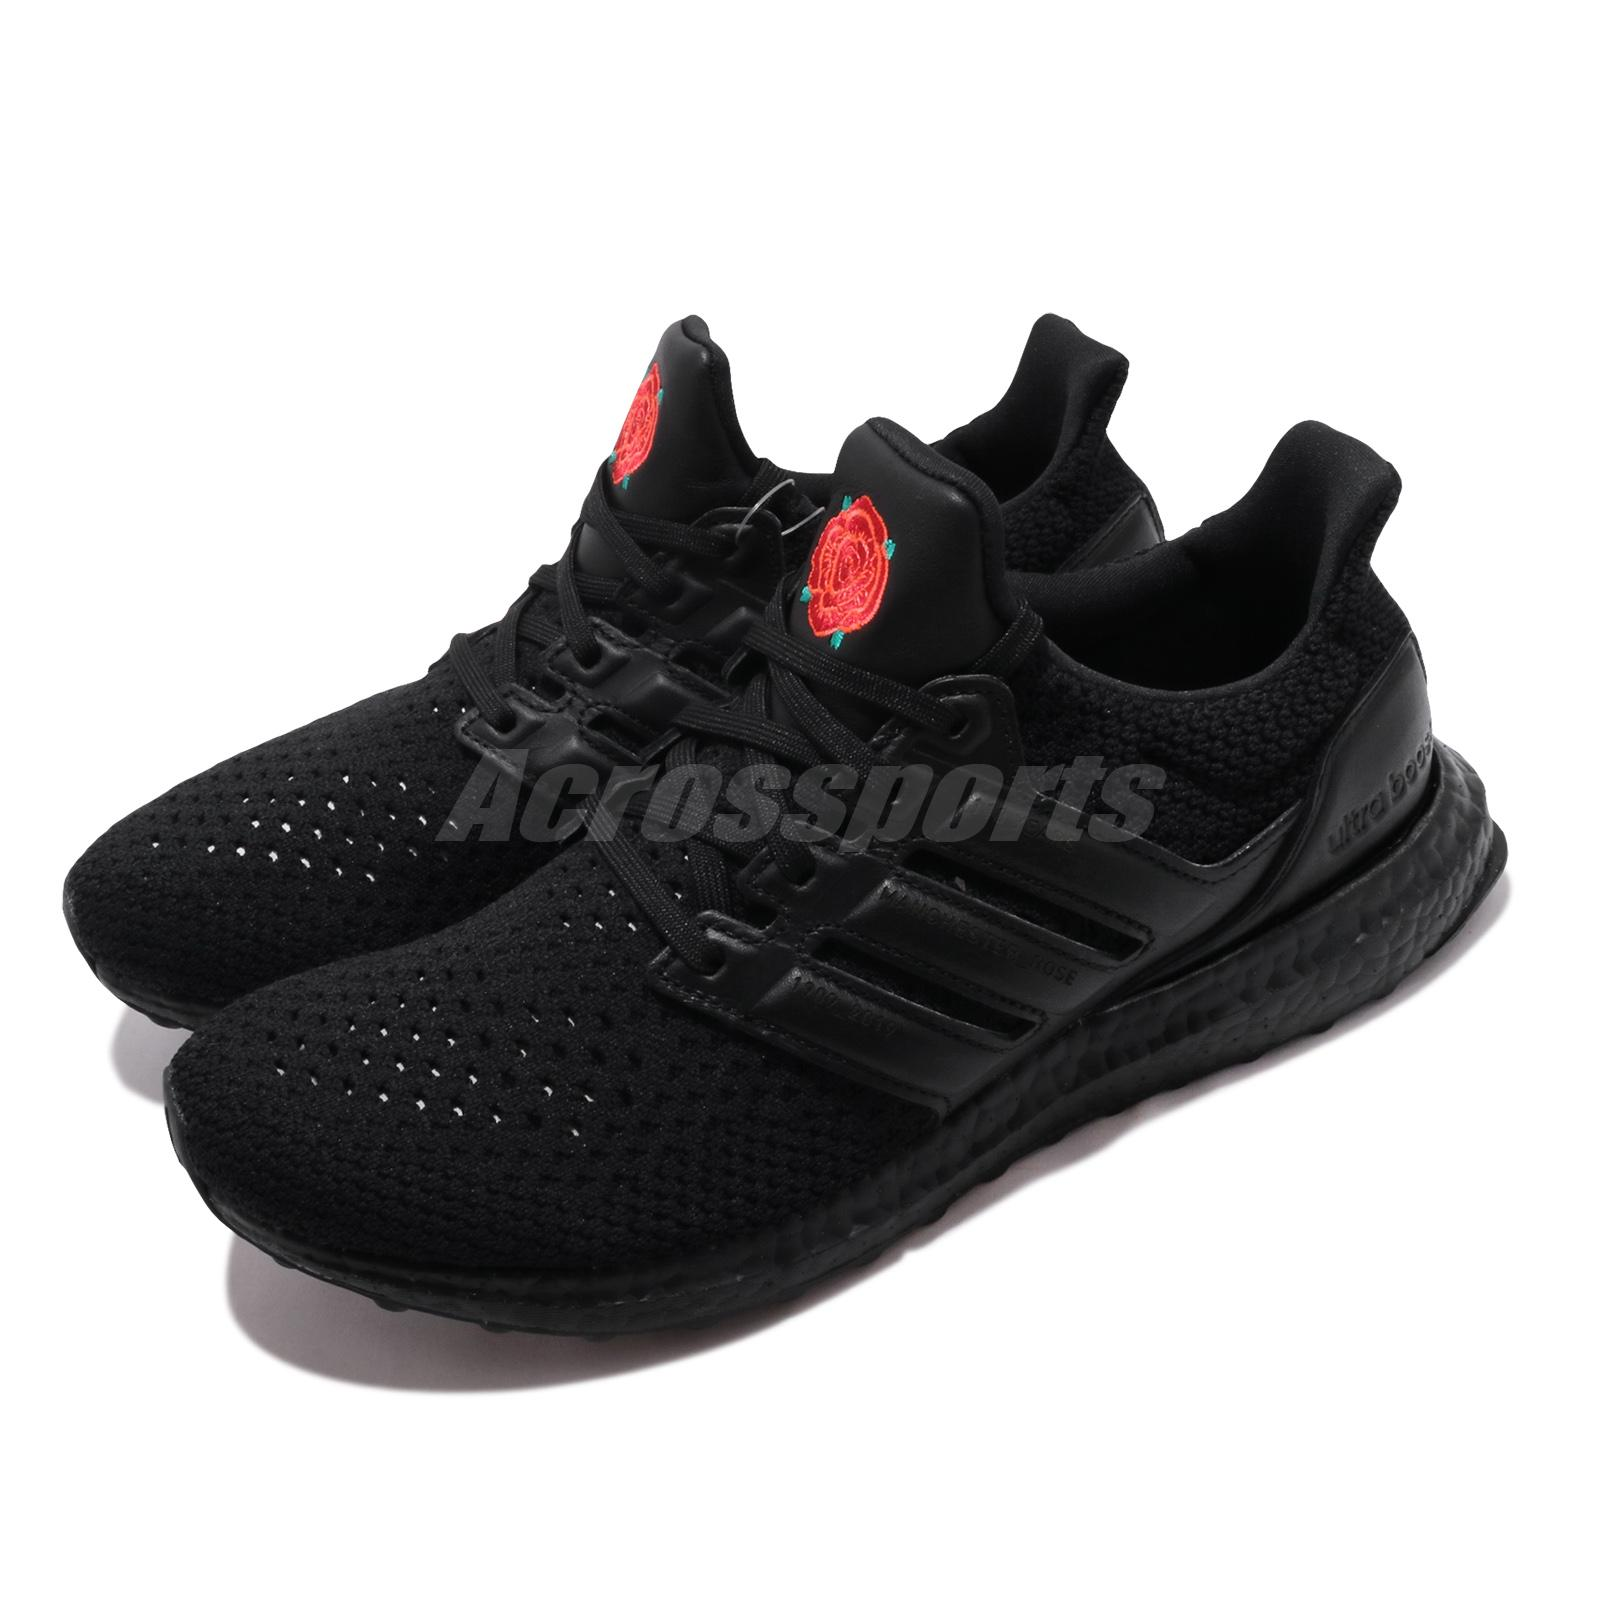 Adidas Ultraboost X Manu Fc Manchester United Rose Black Red Men Shoes Eg8088 Ebay